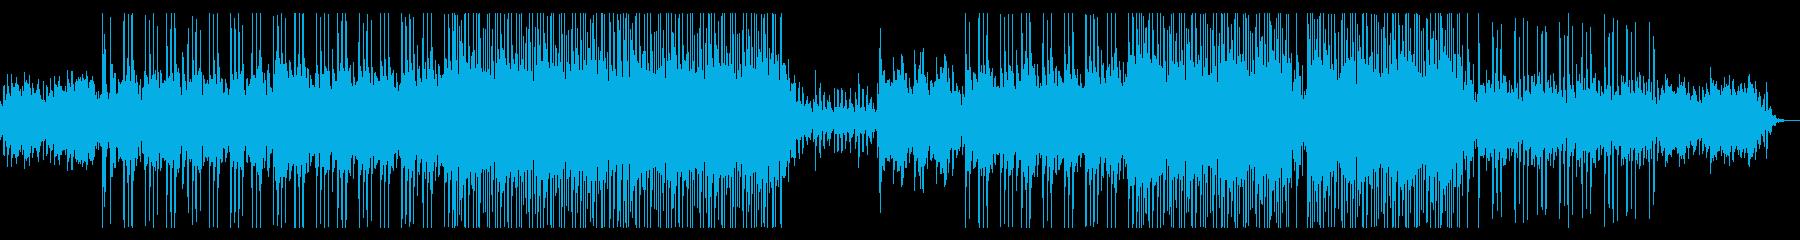 HIPHOPトラック/可愛い/軽快の再生済みの波形